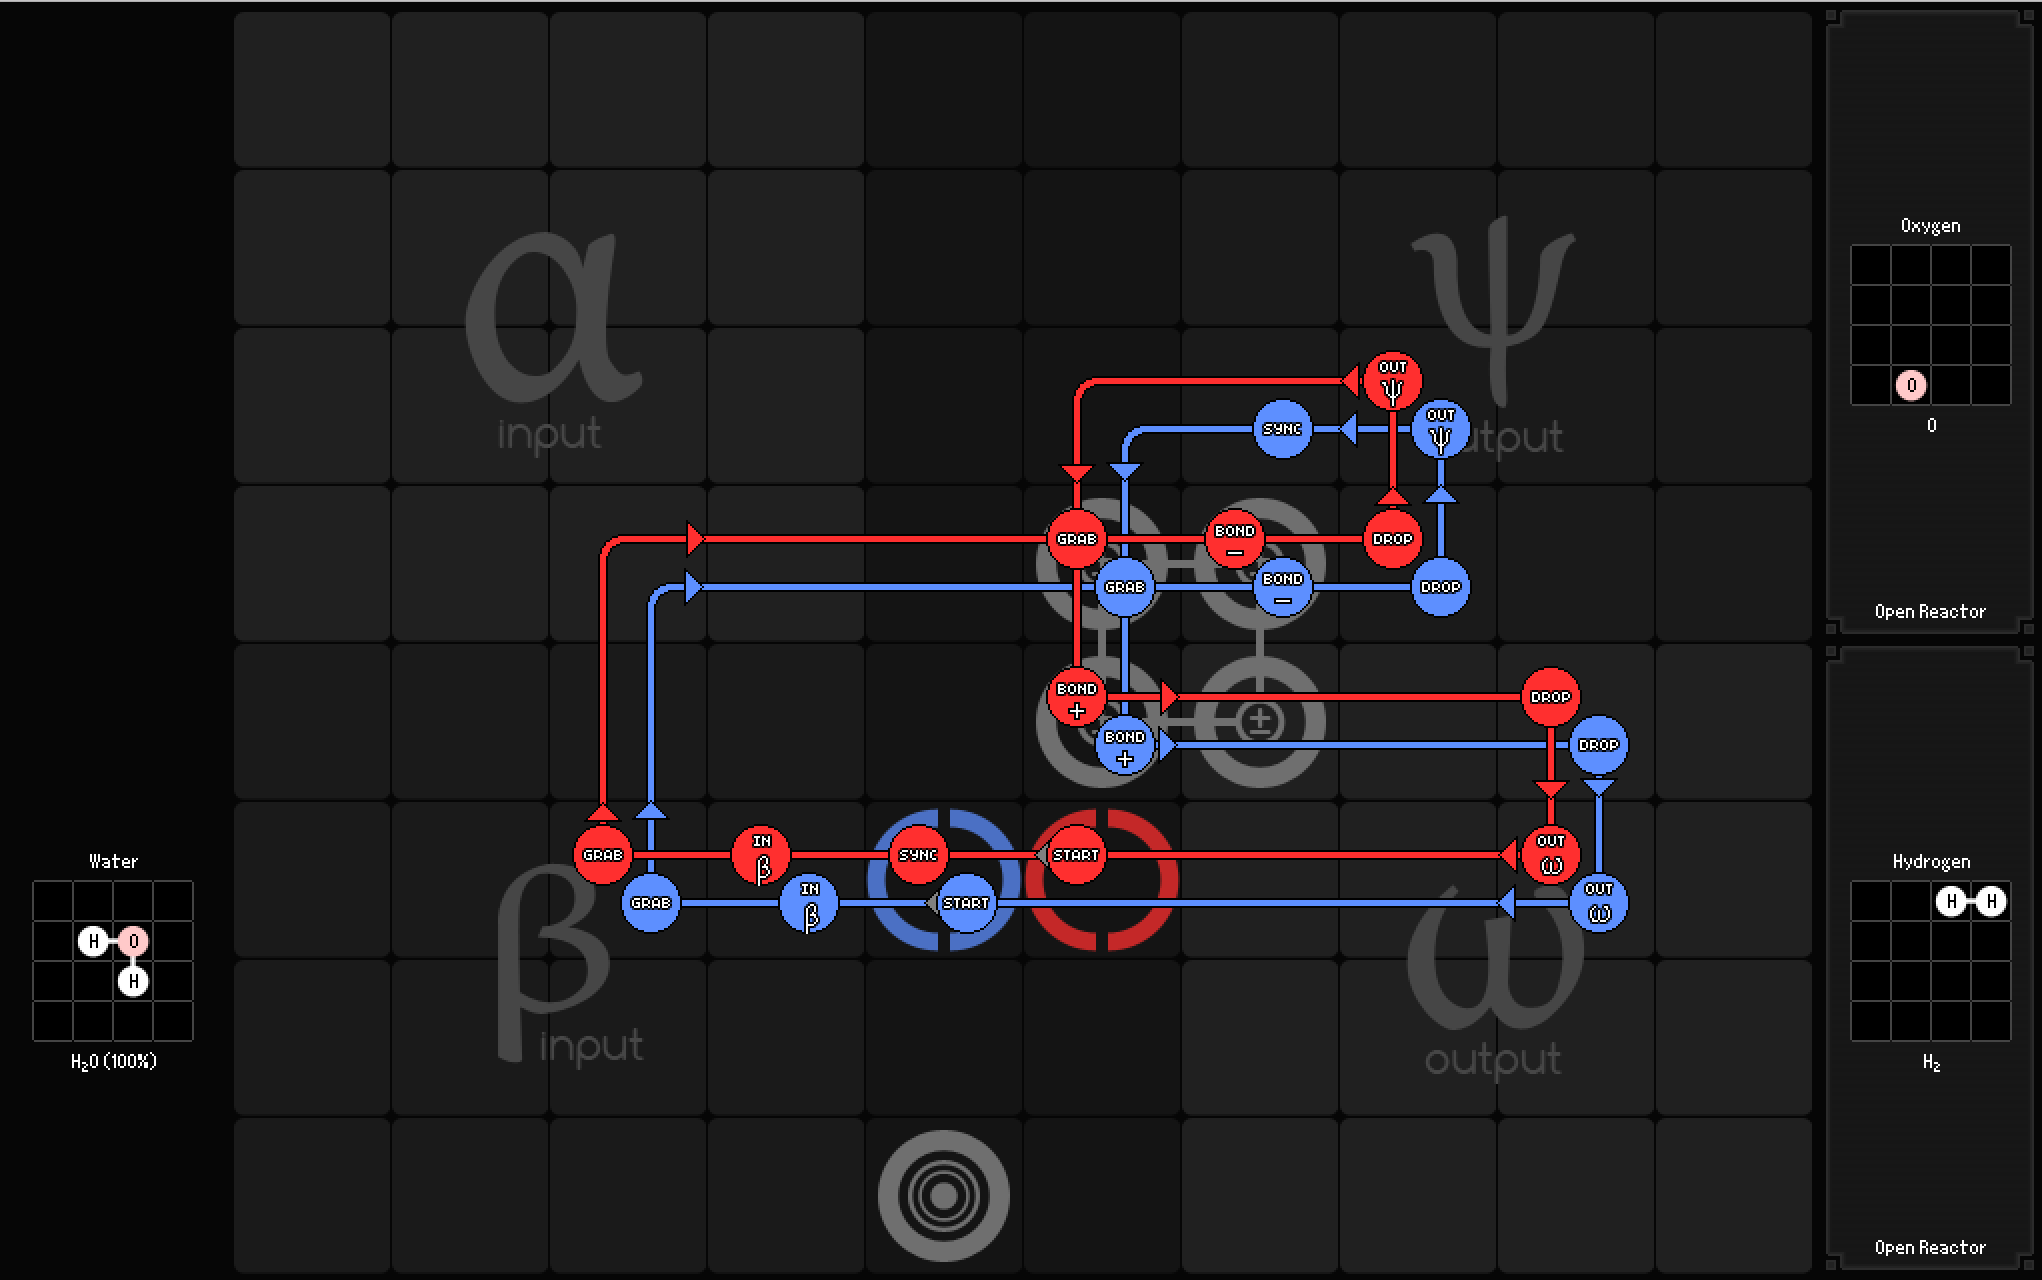 1_Story_Mode/6_Hephaestus_IV/SpaceChem-6.6.a/Reactor_2.png